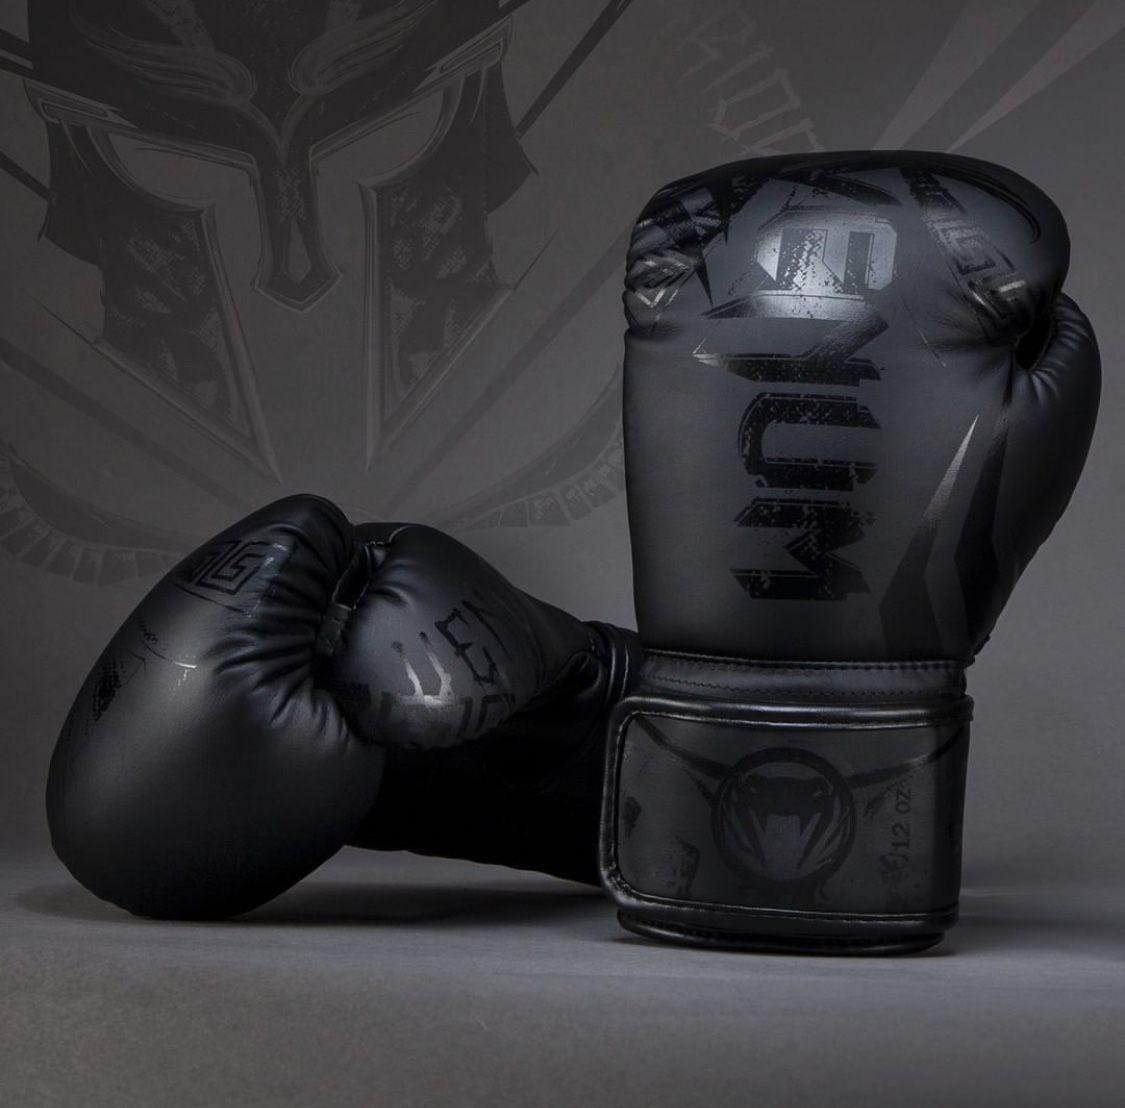 MMA Bjj Muay Thai Boxing Training Sparring VENUM GLADIATOR 3.0 FIGHT SHORTS